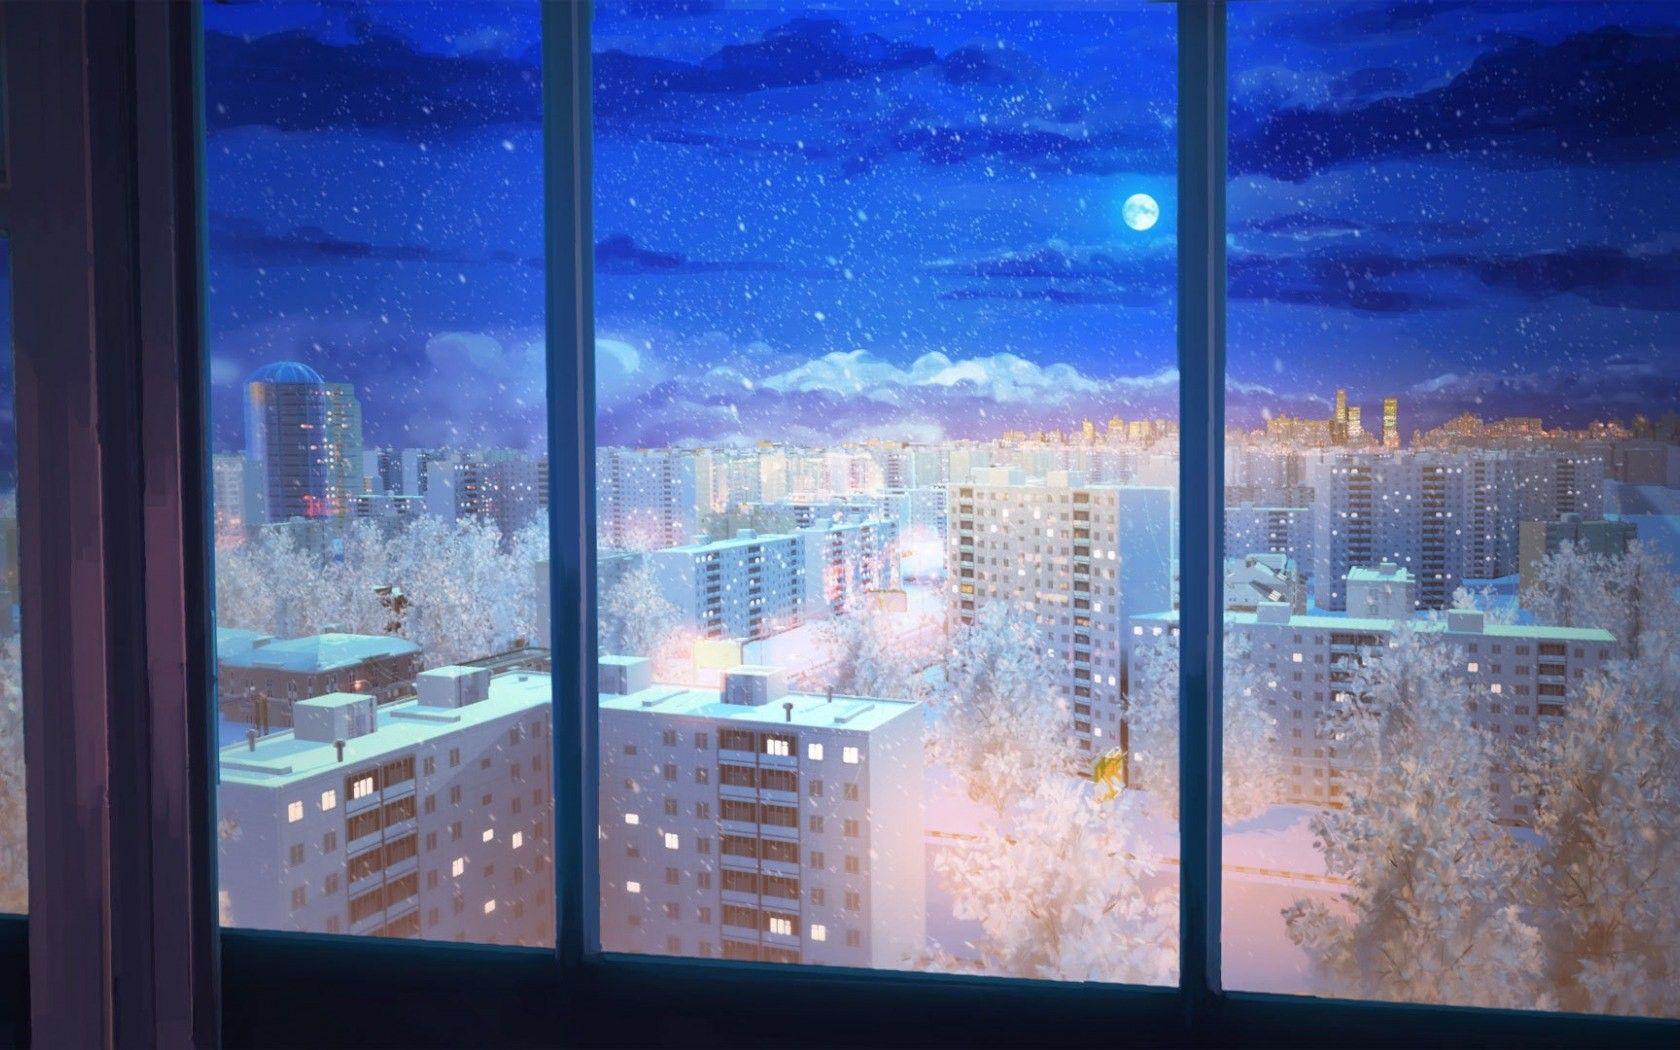 Cozy View 16801050 Anime Scenery Wallpaper Anime Scenery